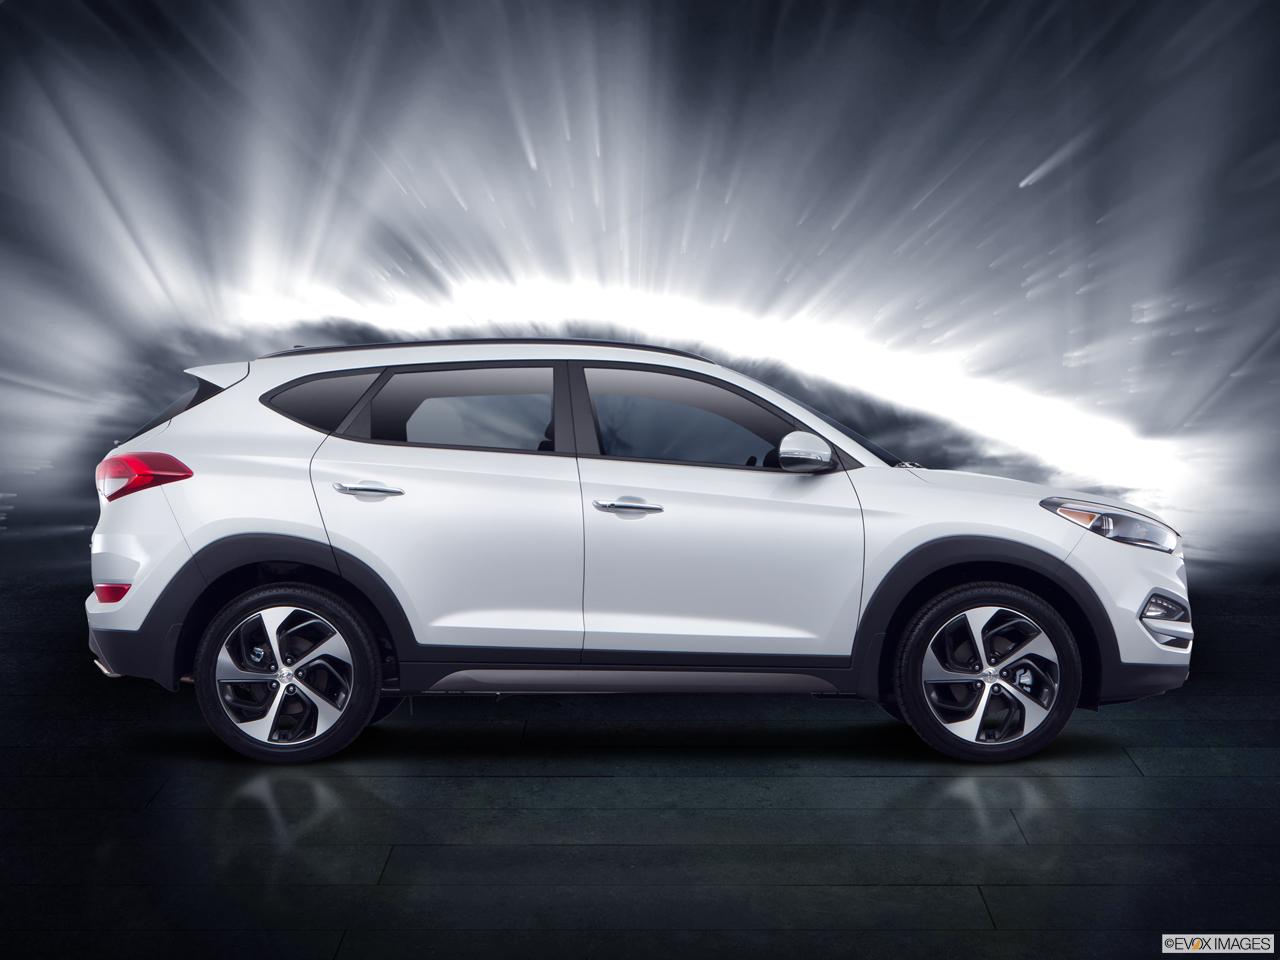 2016 Hyundai Tuscon For Sale Near Stockton Premier